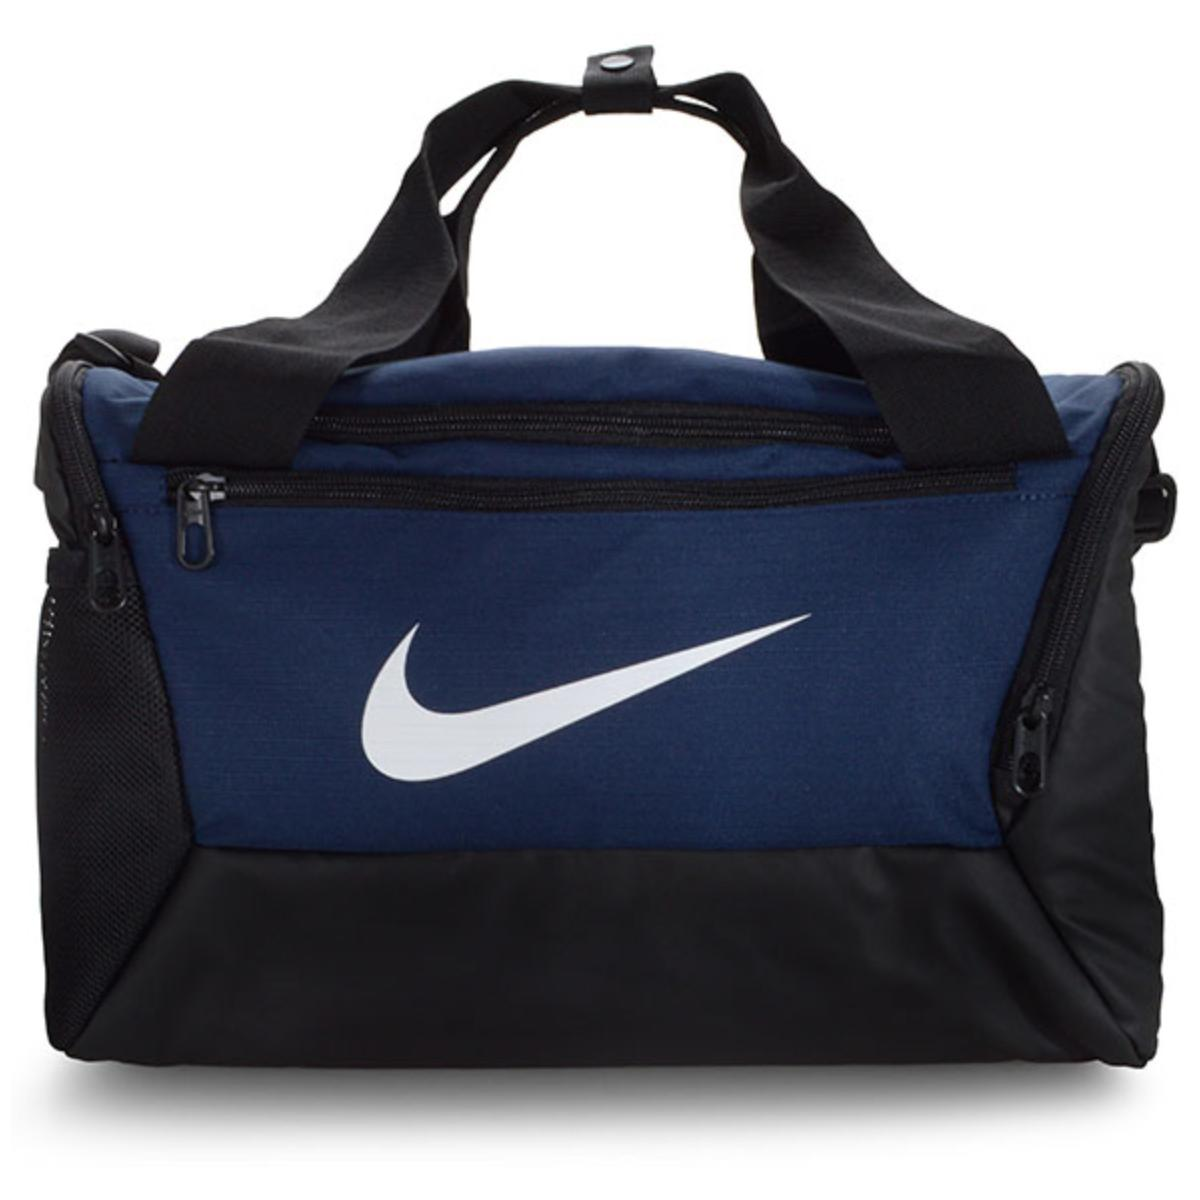 Bolsa Unisex Nike Ba5961-410 Brasilia Preto/marinho